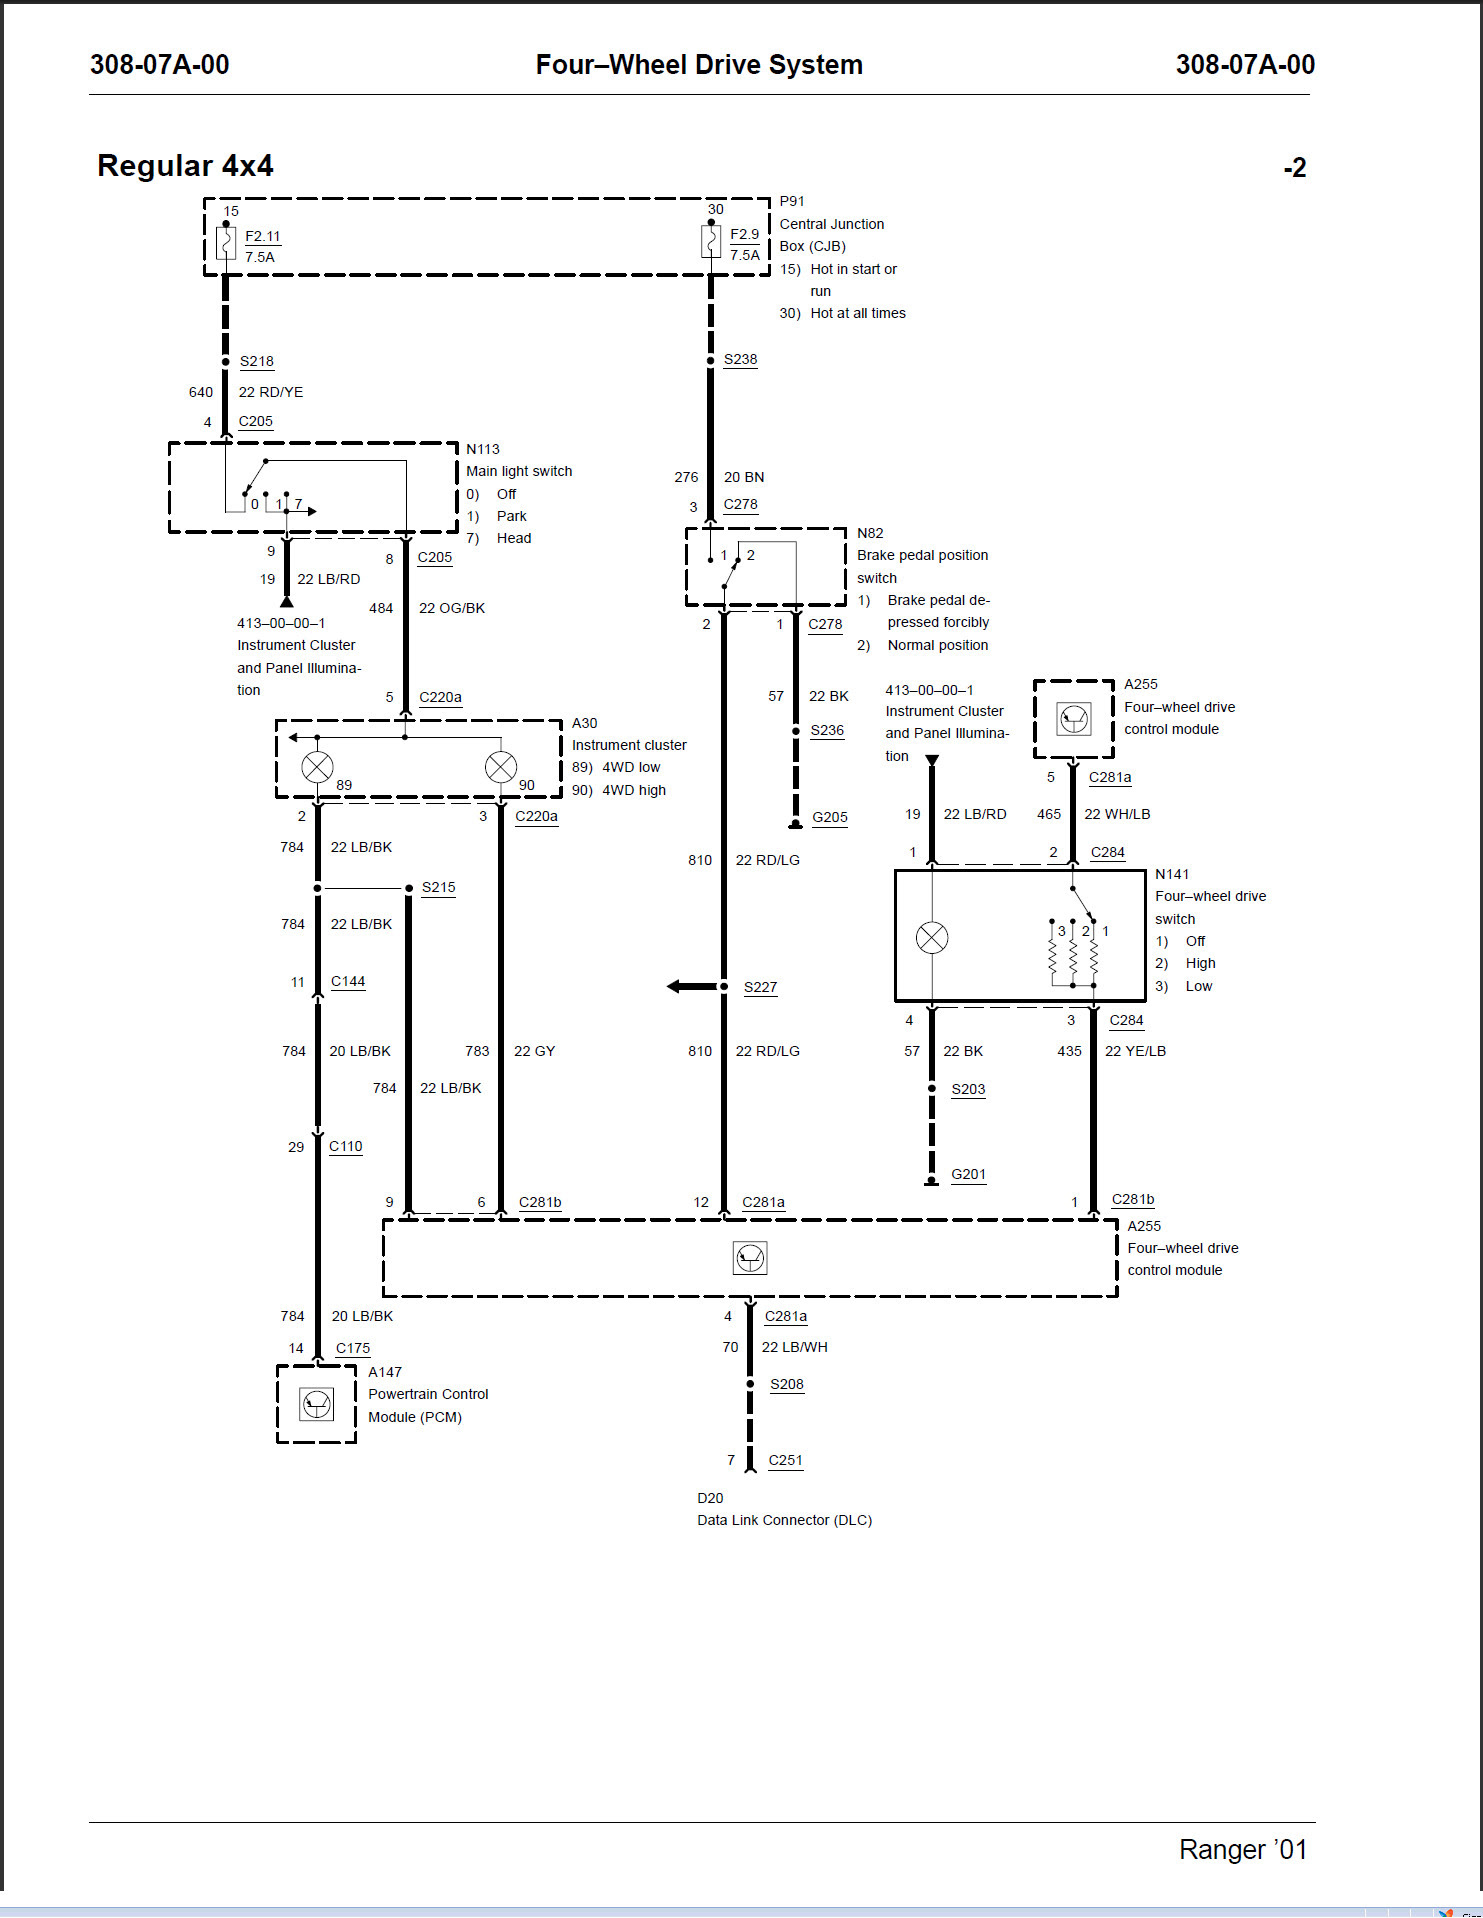 Diagram 2004 Ranger 4wd Fuse Diagram Full Version Hd Quality Fuse Diagram Rewiringlamp Biorygen It